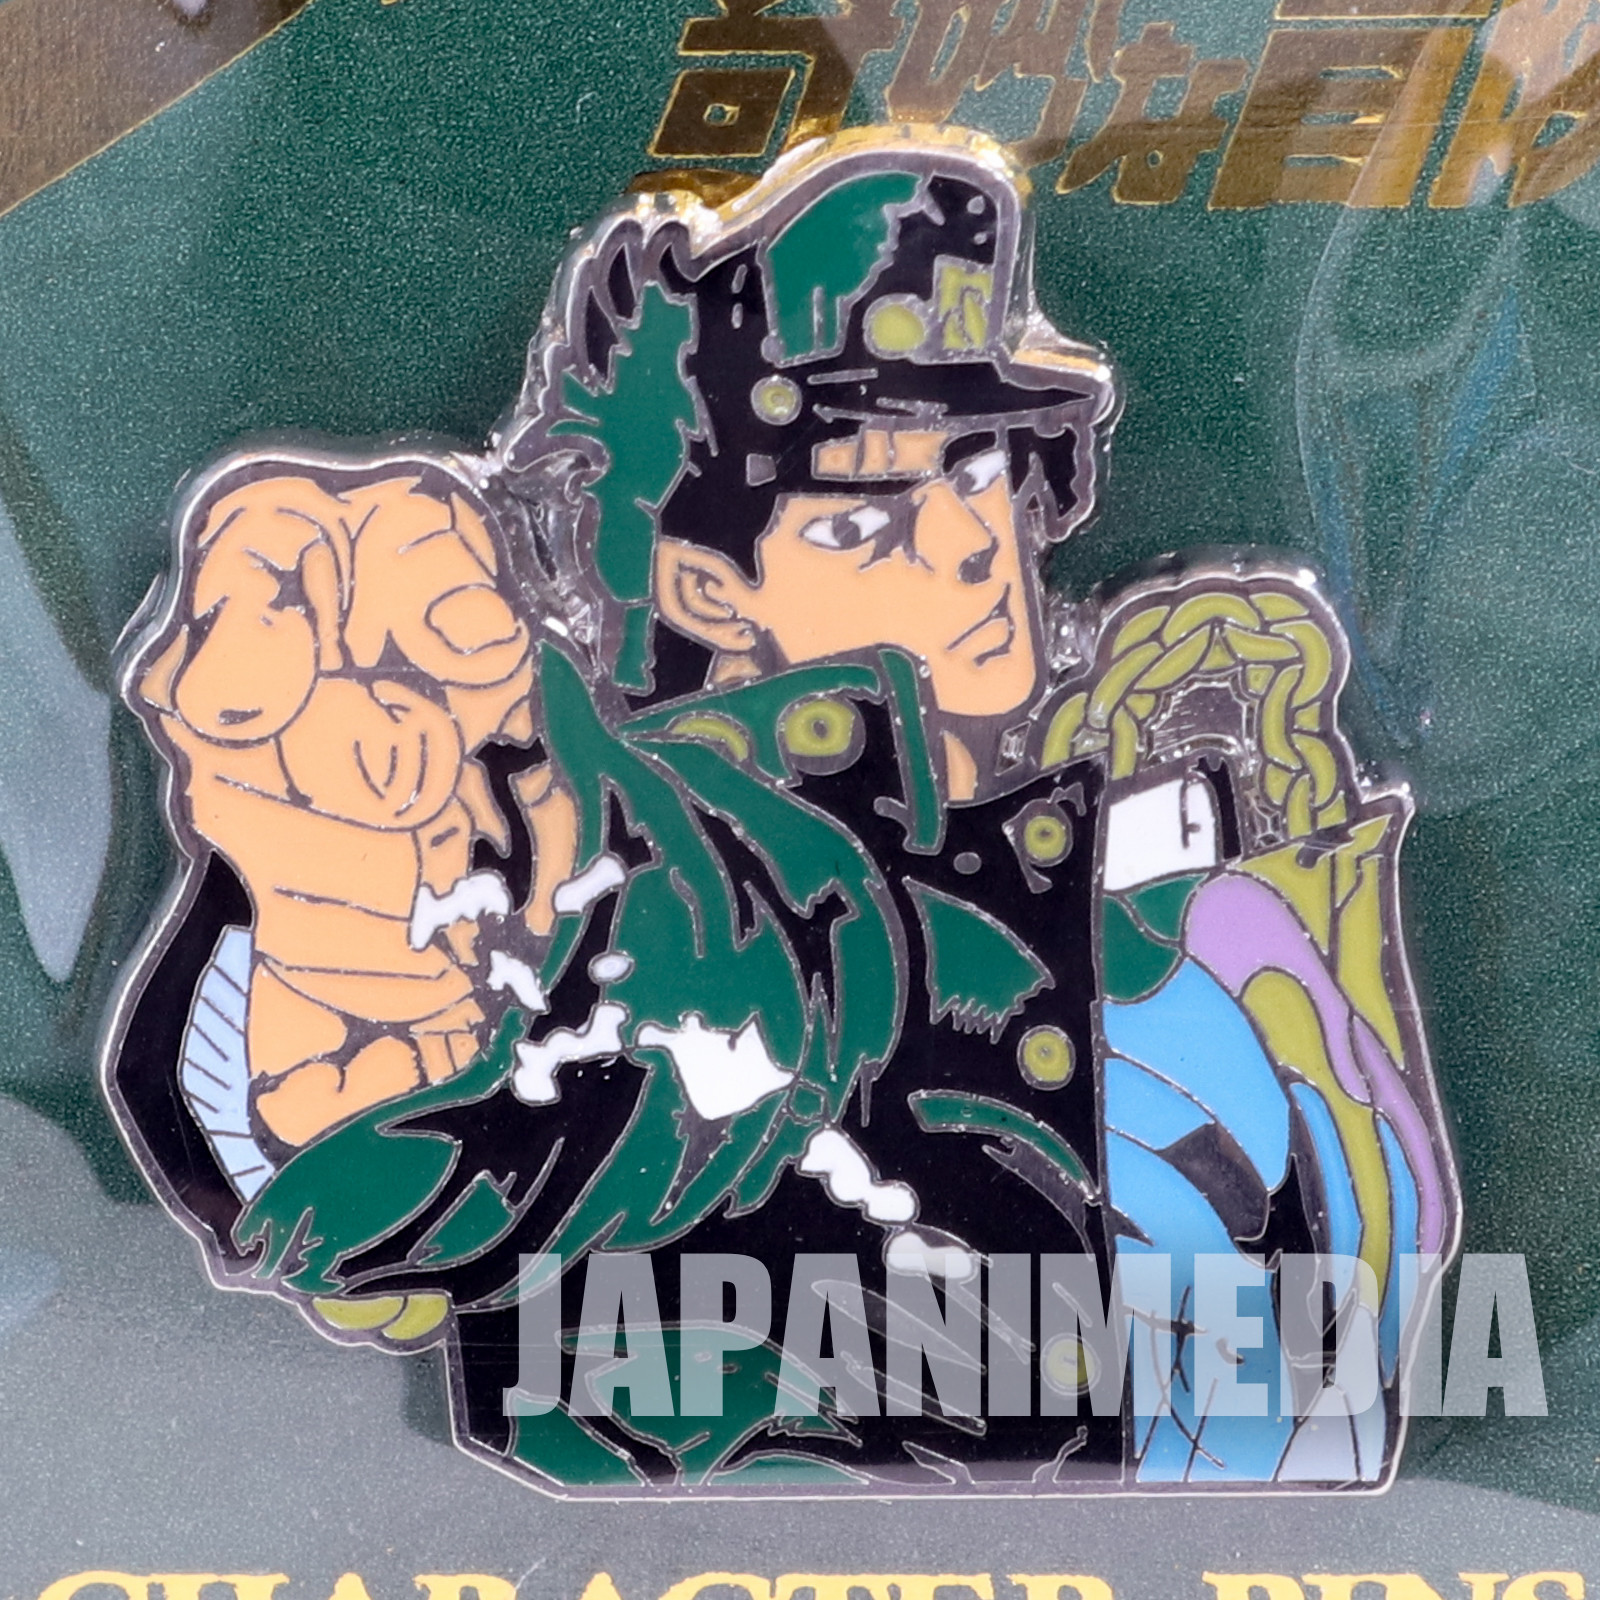 JoJo's Bizarre Adventure Kujo Jotaro Metal Pins JAPAN ANIME